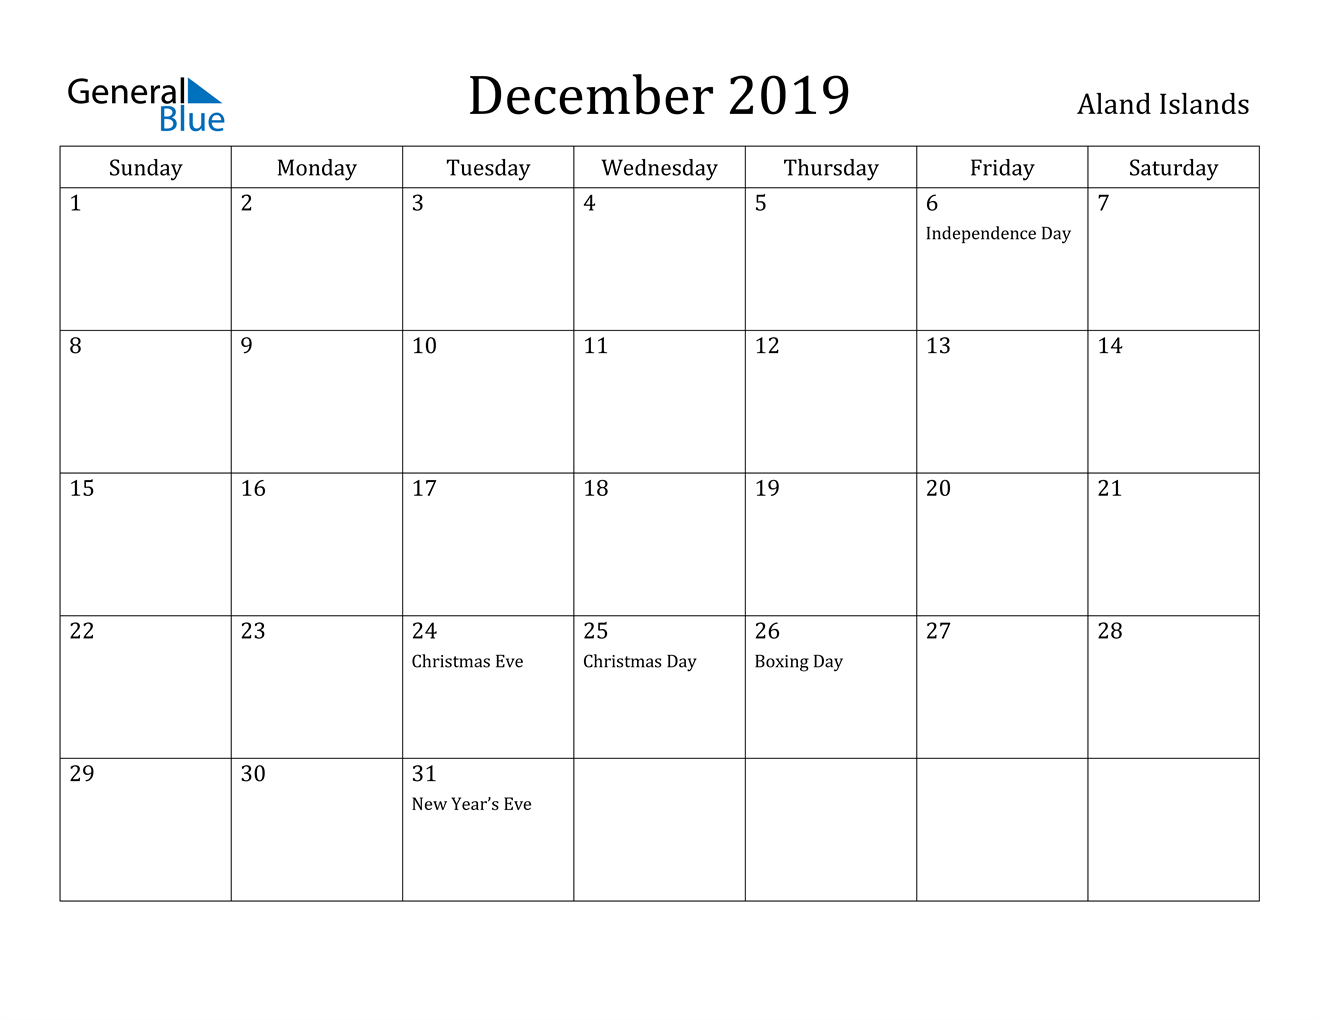 Image of December 2019 Aland Islands Calendar with Holidays Calendar